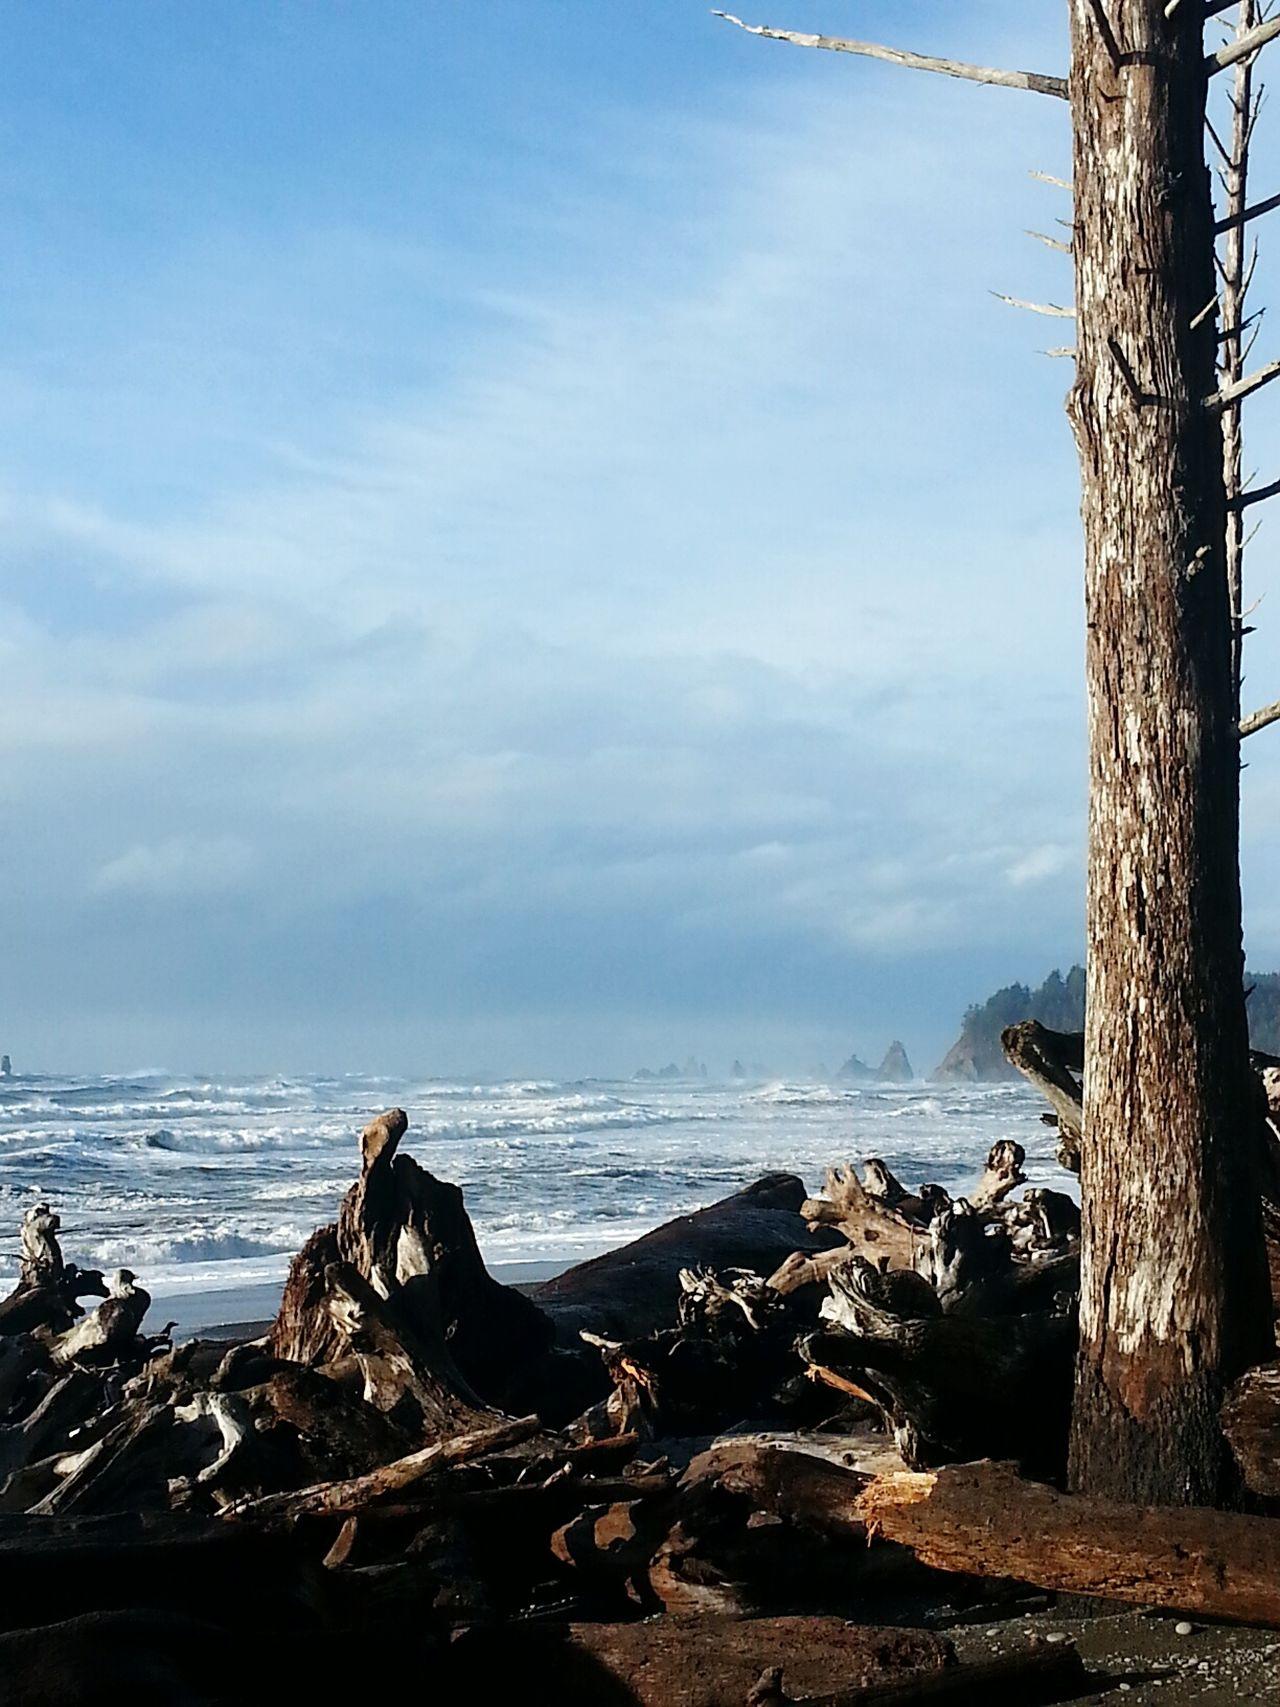 Rialto Beach Oceanside Betterlandscapes Washington Coast Stormy Beach Pacific Ocean Beauty In Nature Sky Driftwood